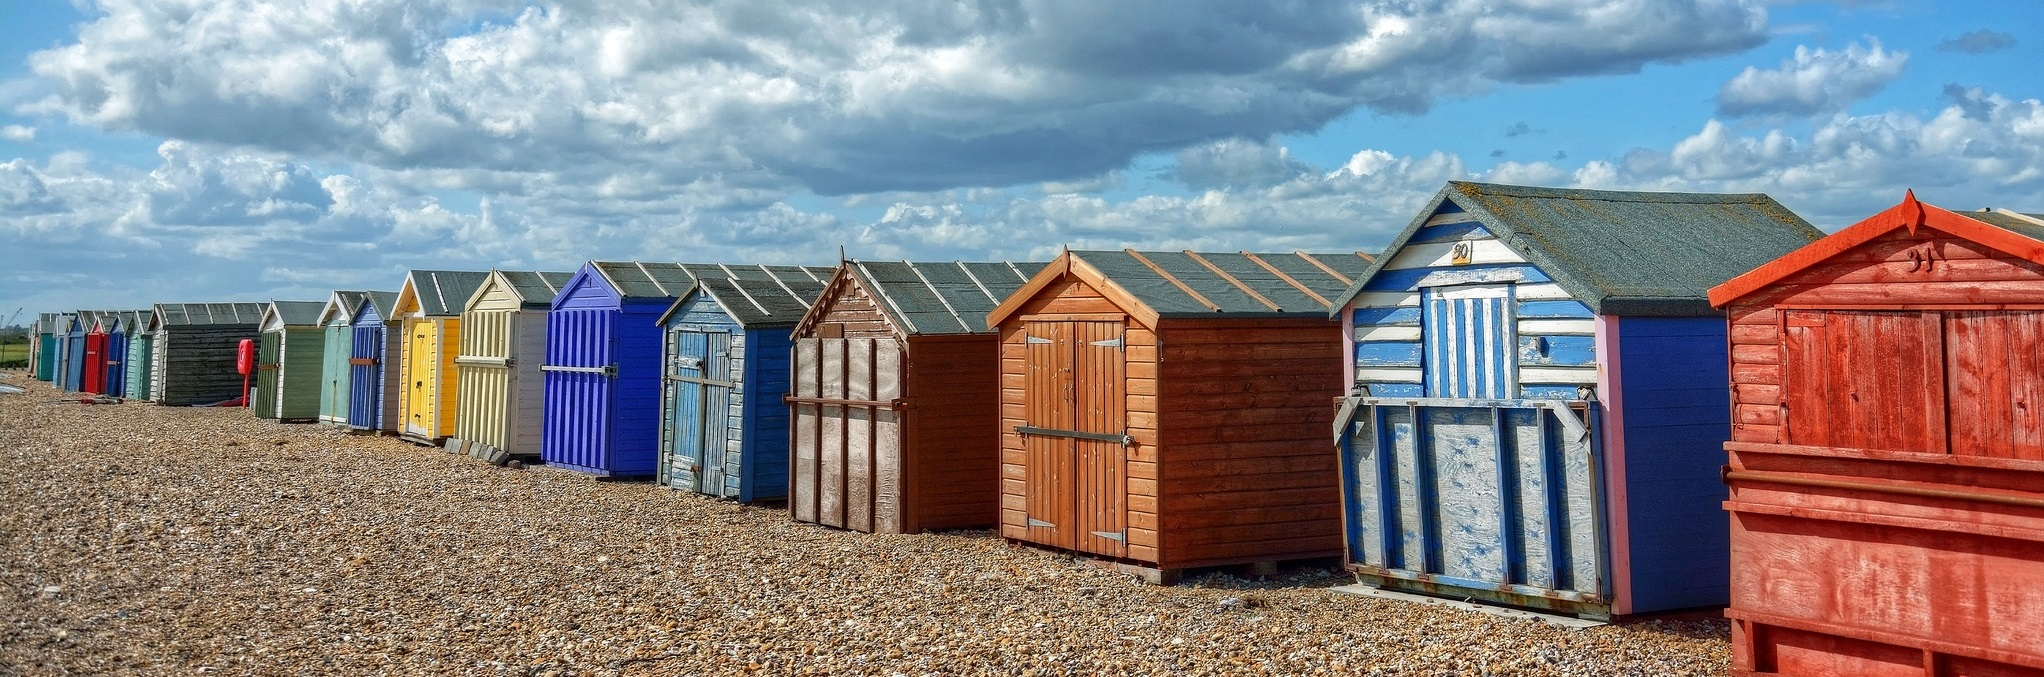 seaside cottages, coastal holiday rentals